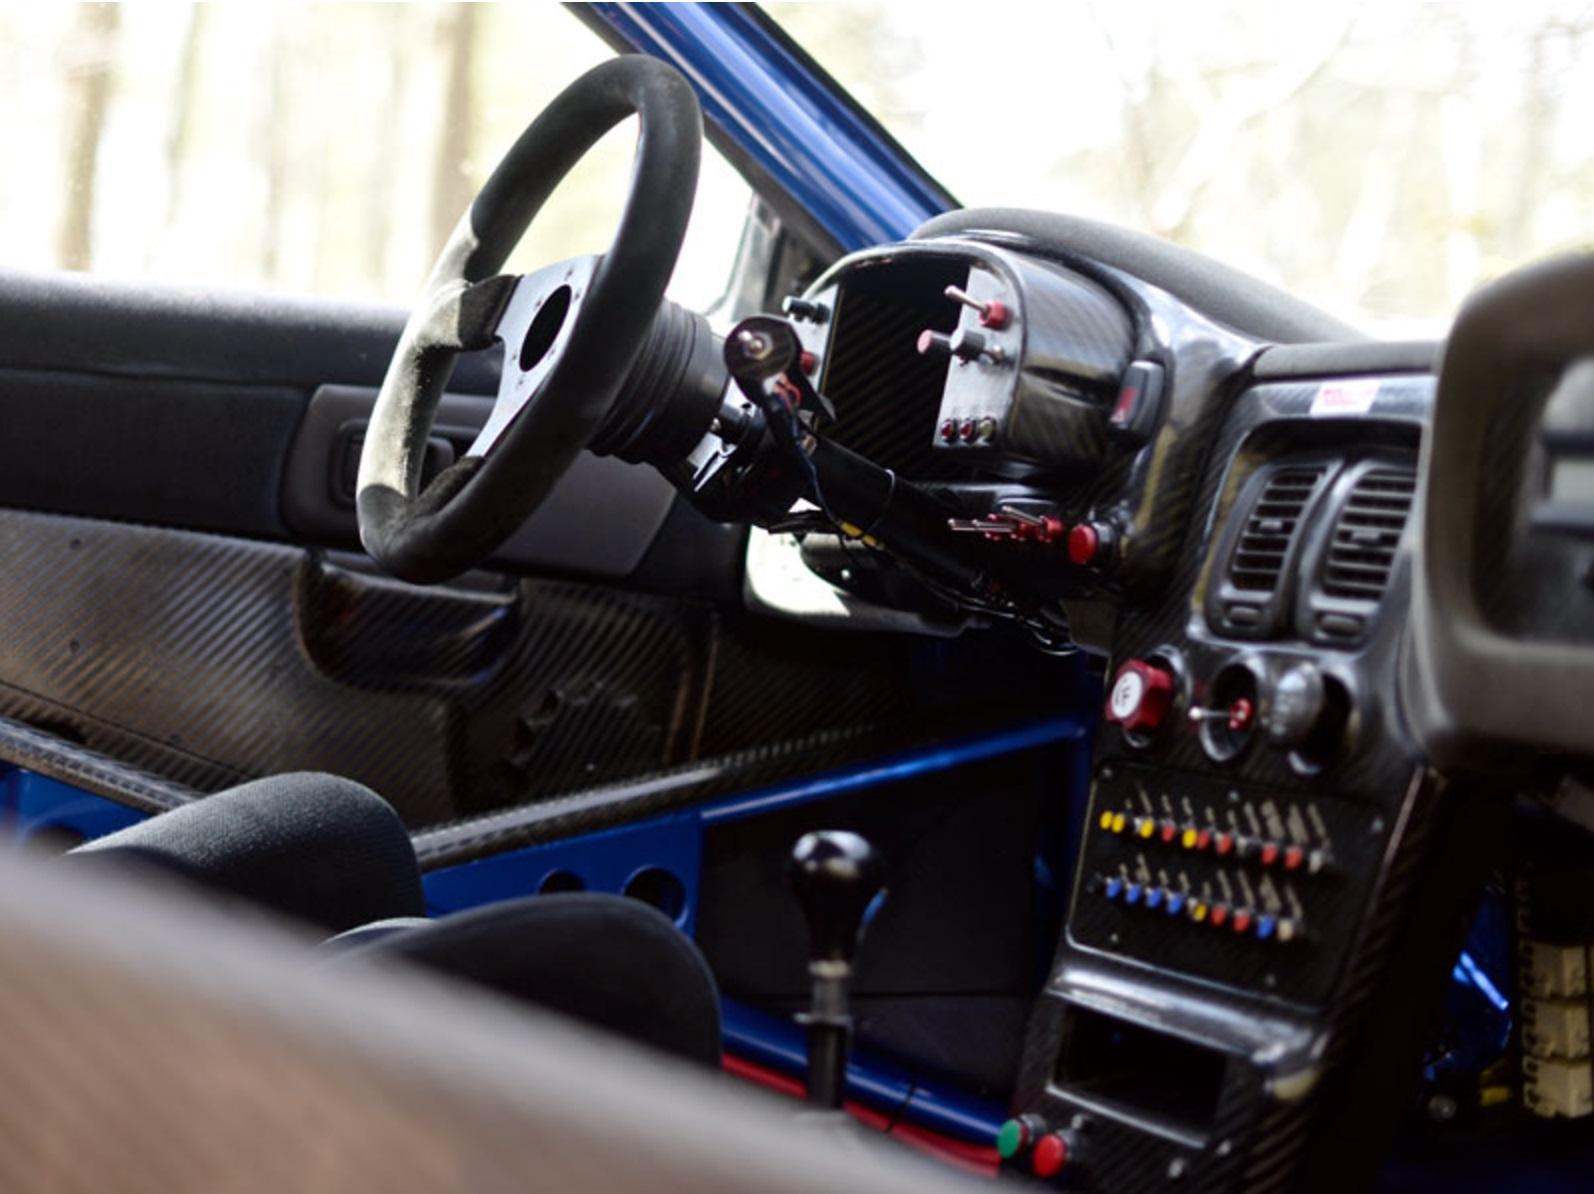 Subaru Impreza WRC Test Car Colin McRae (5)